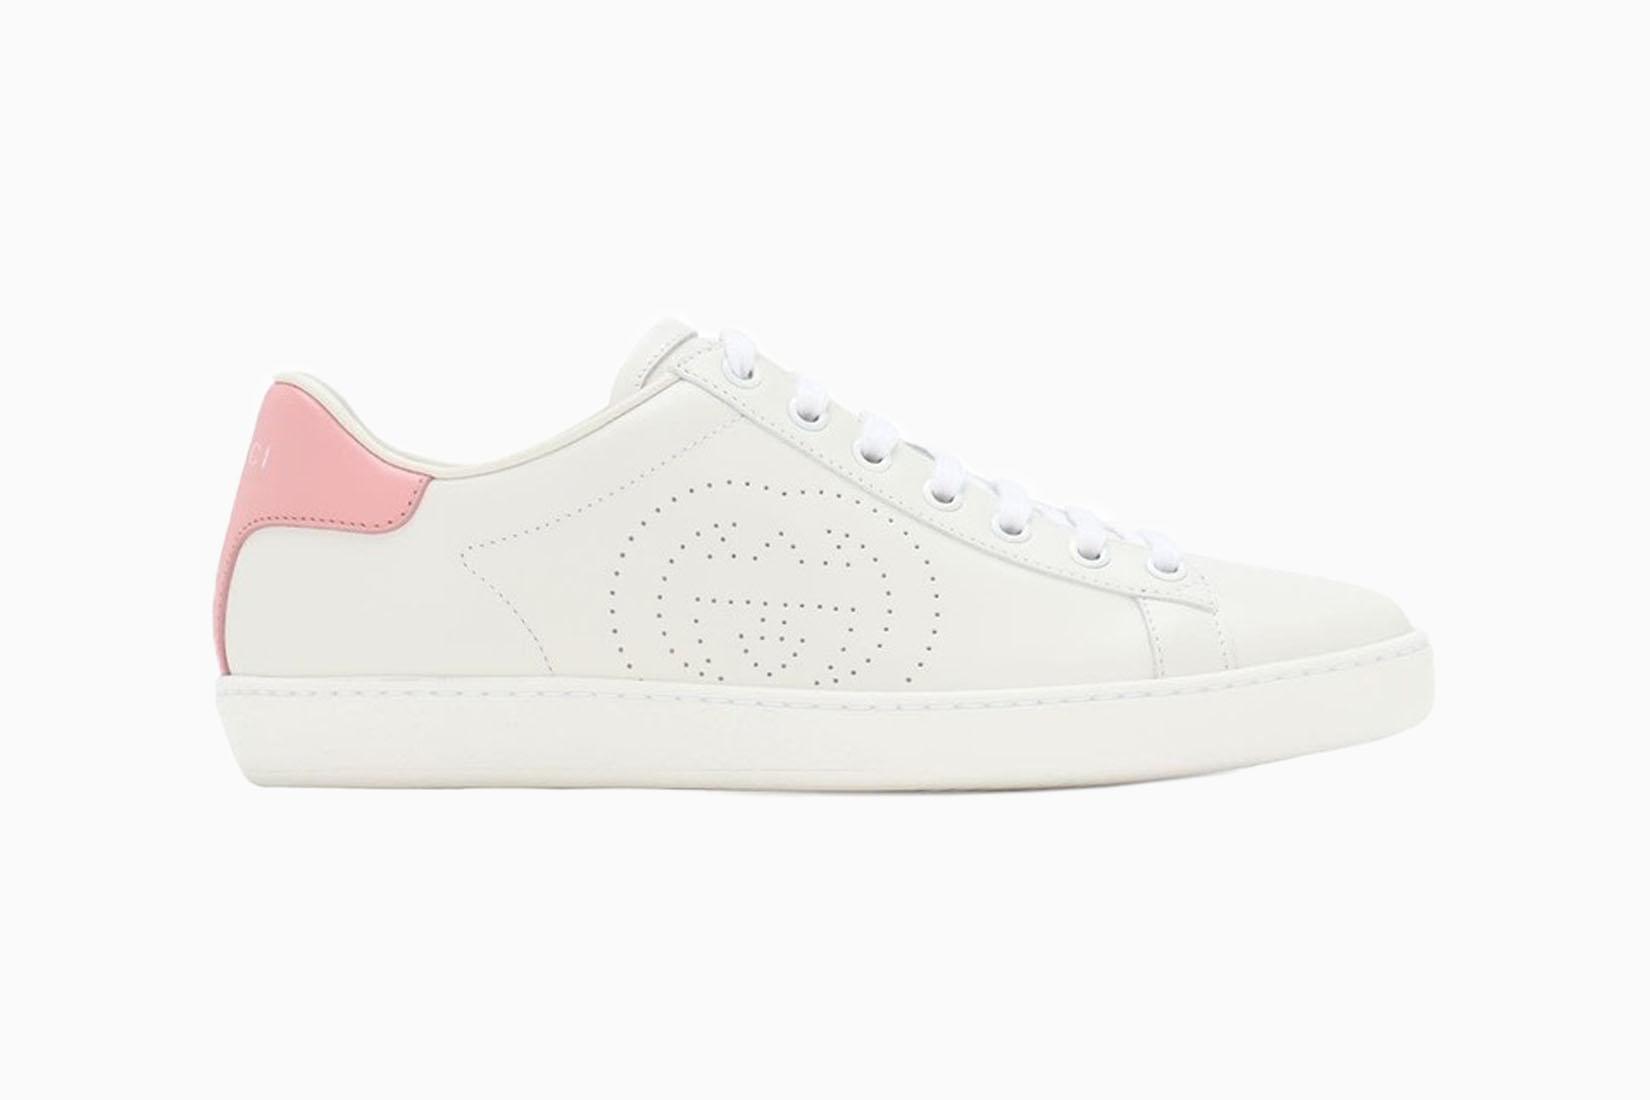 best sneakers women gucci review Luxe Digital